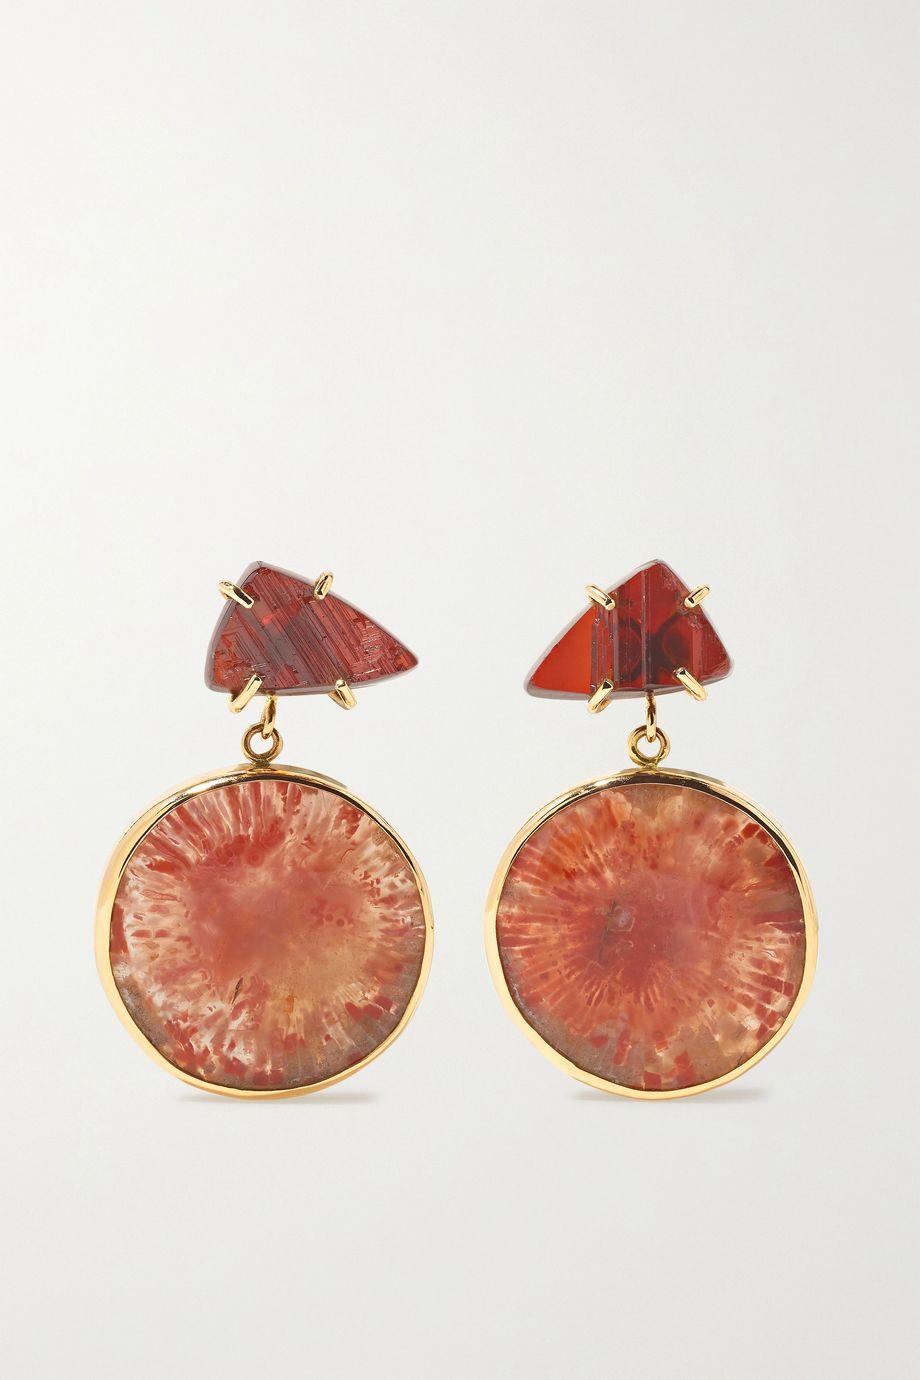 Melissa Joy Manning 14-karat gold, red horn coral and garnet earrings